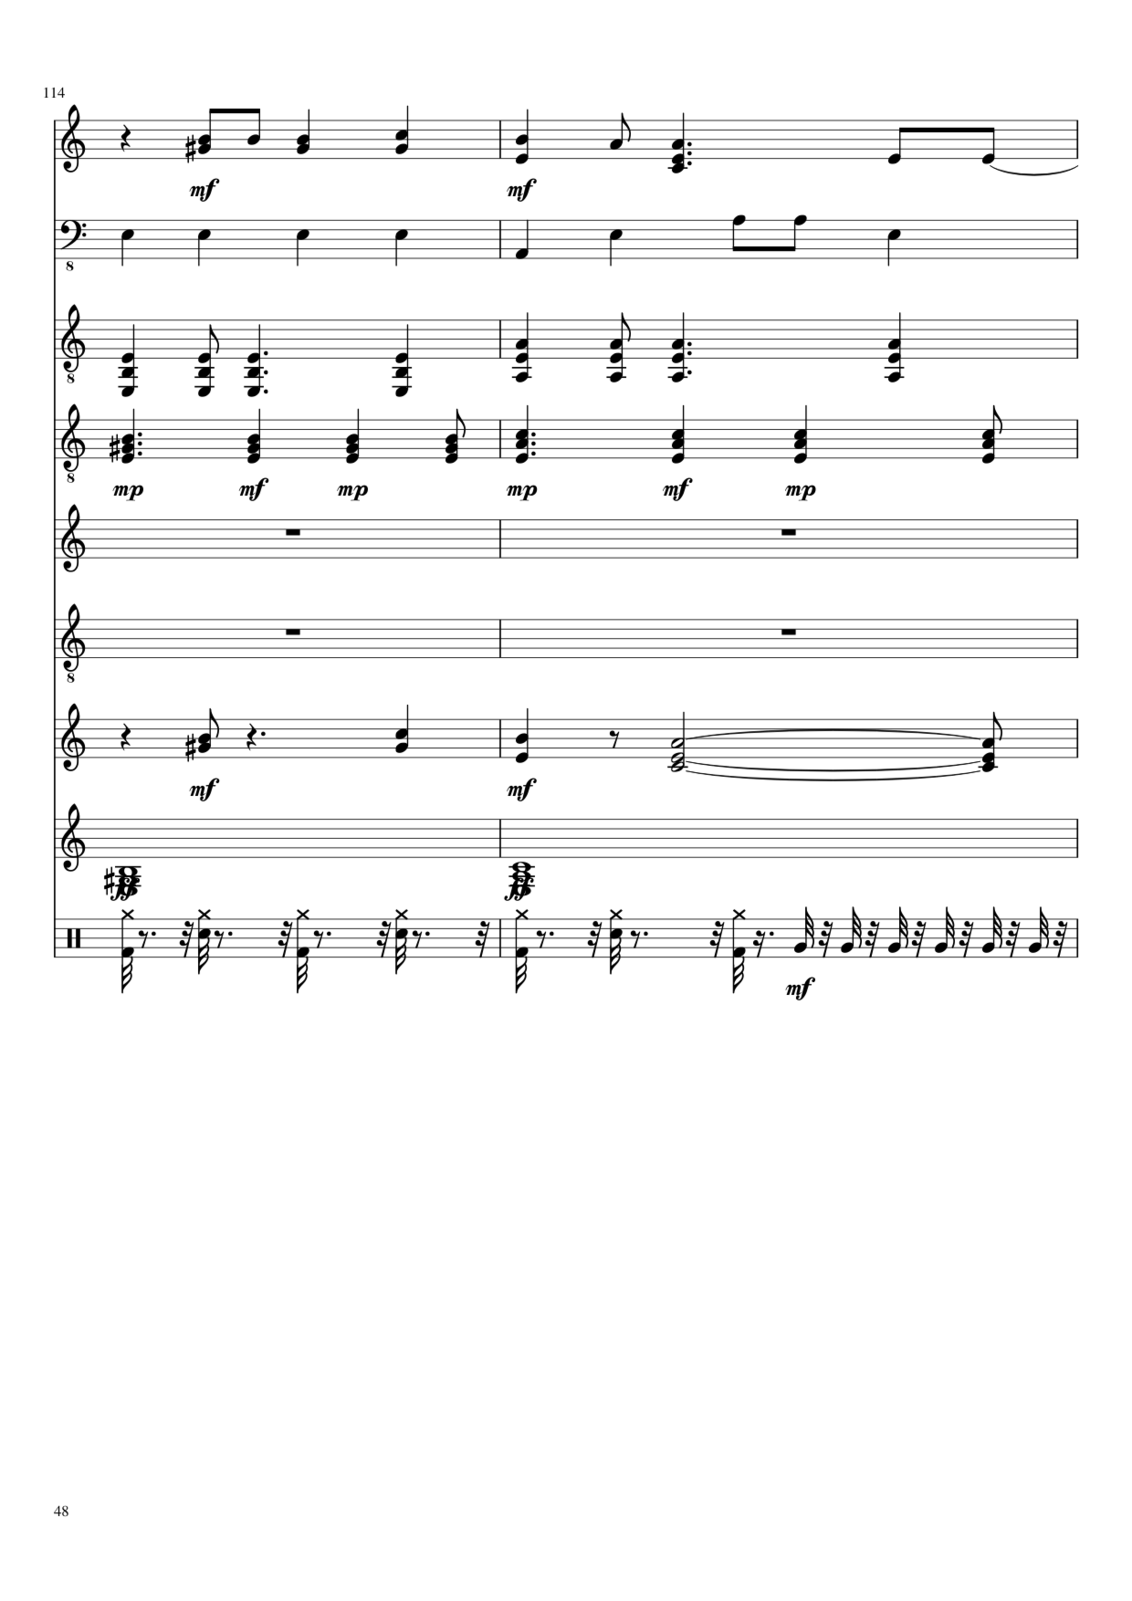 Mrs. Vandebilt slide, Image 48